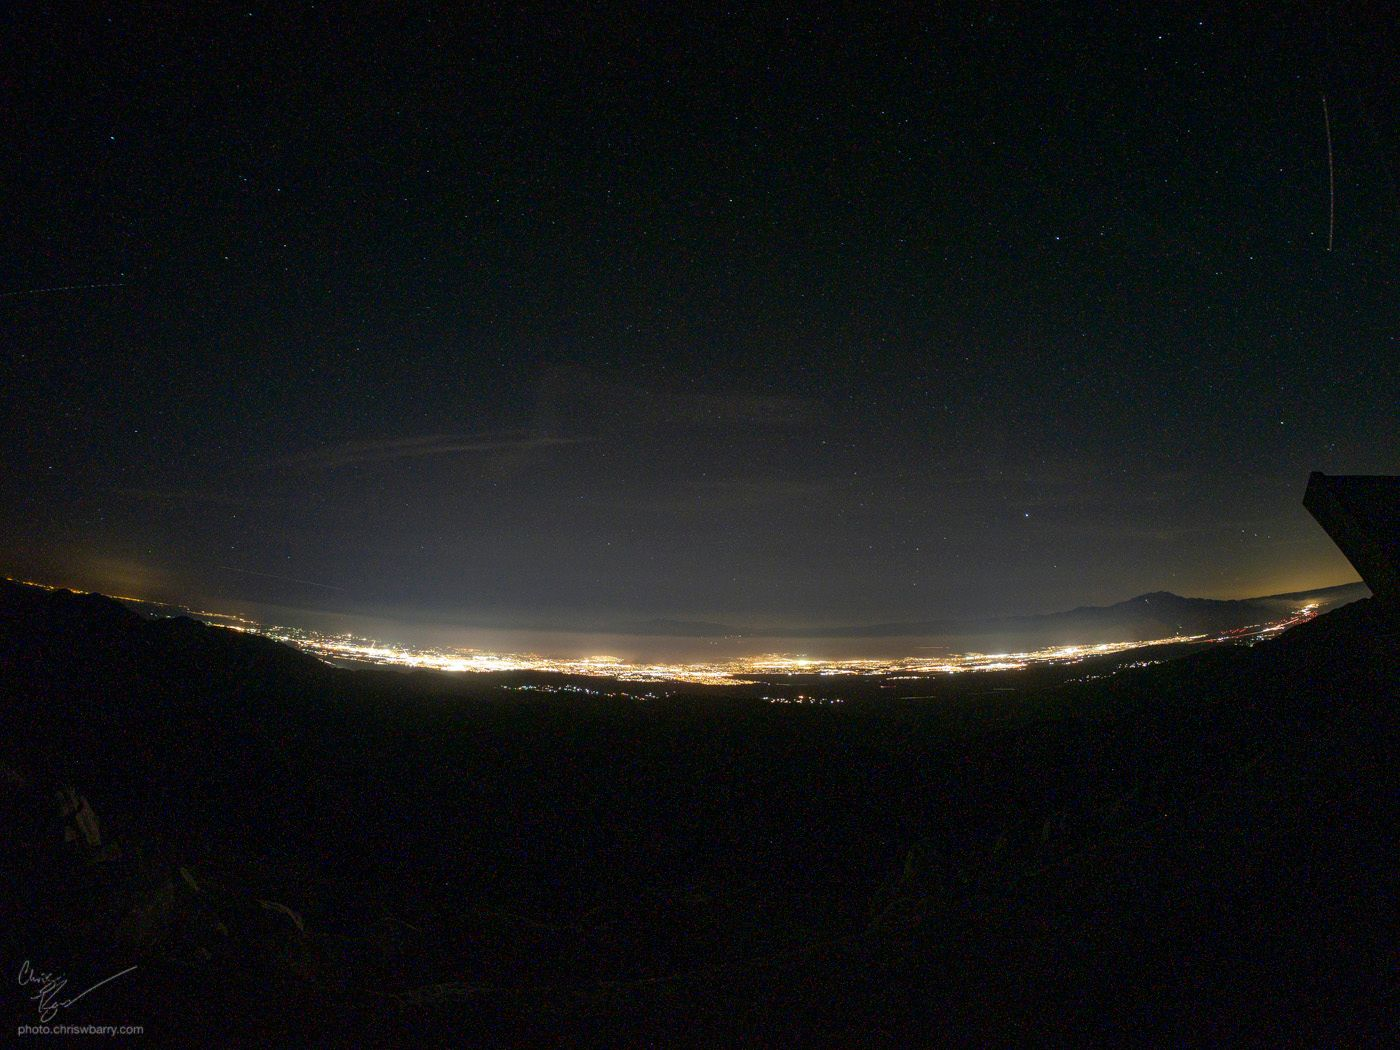 4-30-19: Keys View (Night Mode)